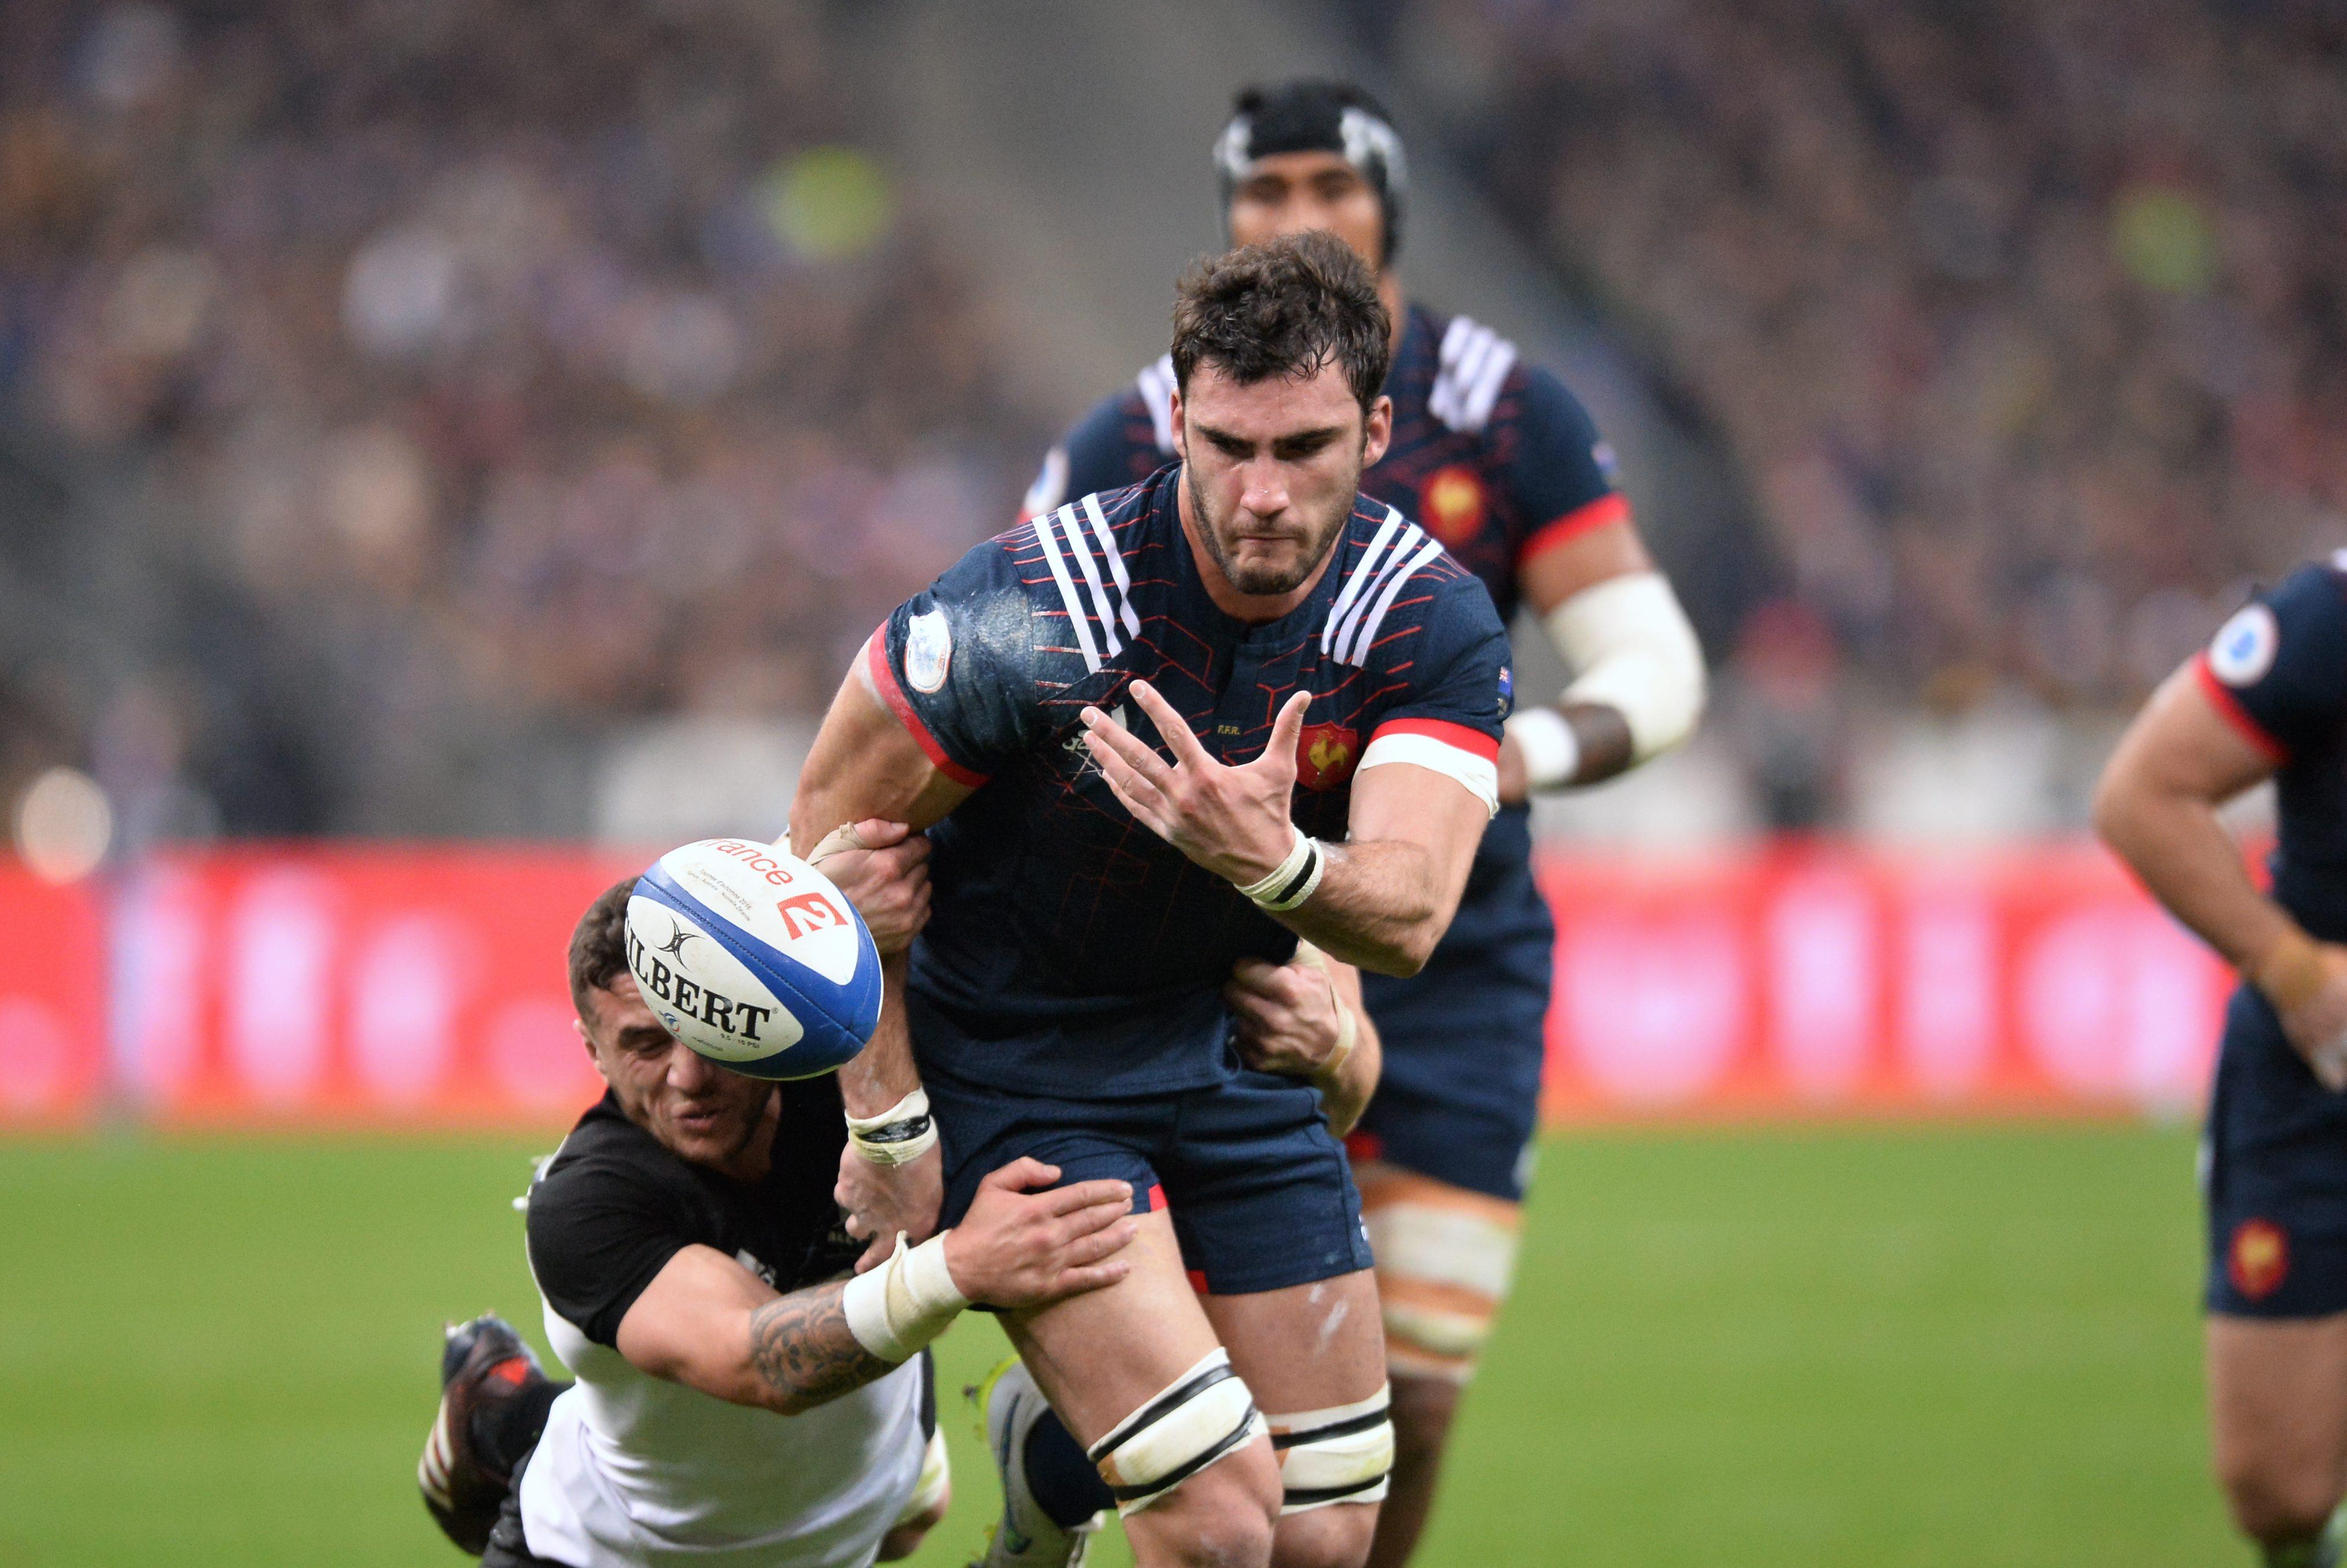 Rugby - XV de France - Bastareaud et Chouly forfaits, Ollivon en pole